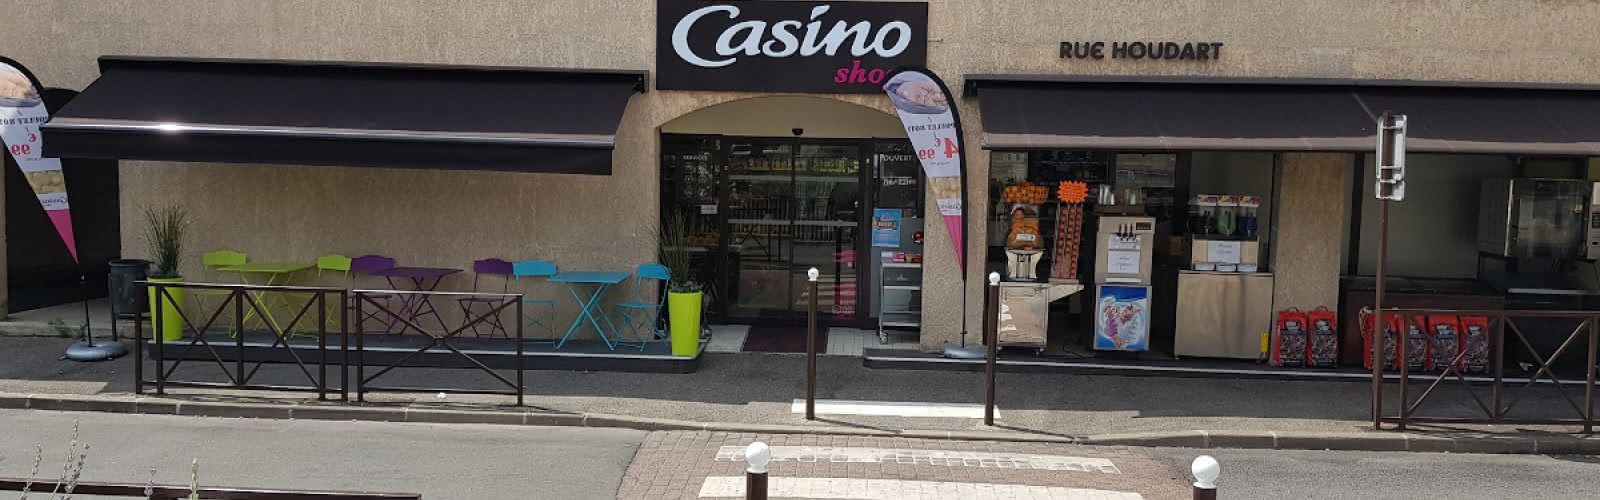 Casino Shop, Roissy-en-France